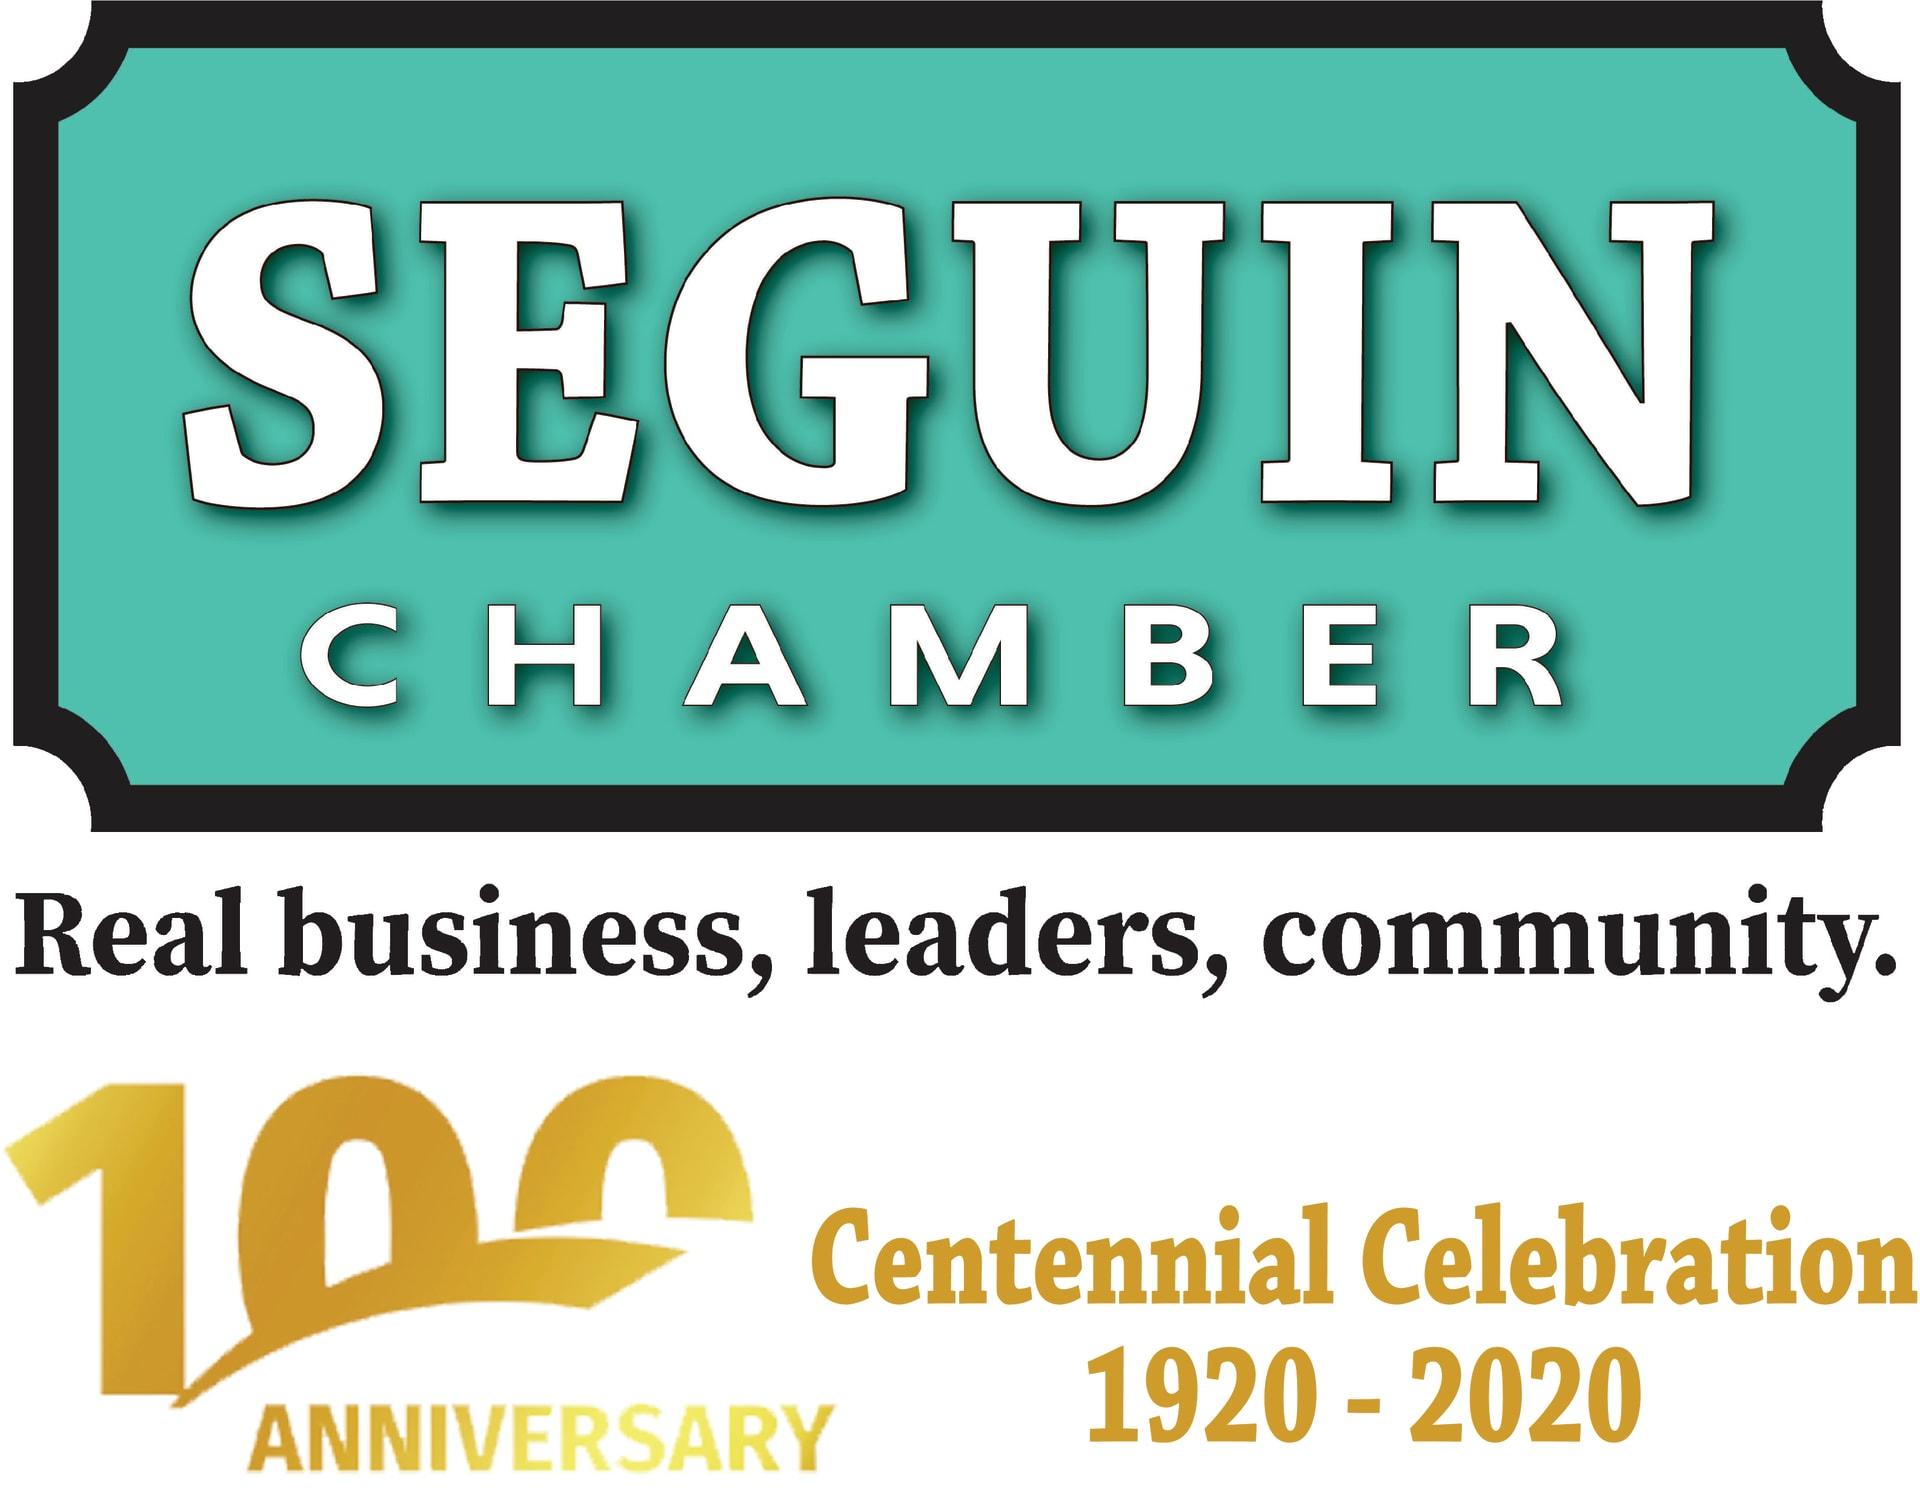 Chamber-logo_100th-anniversary-w1920.jpg